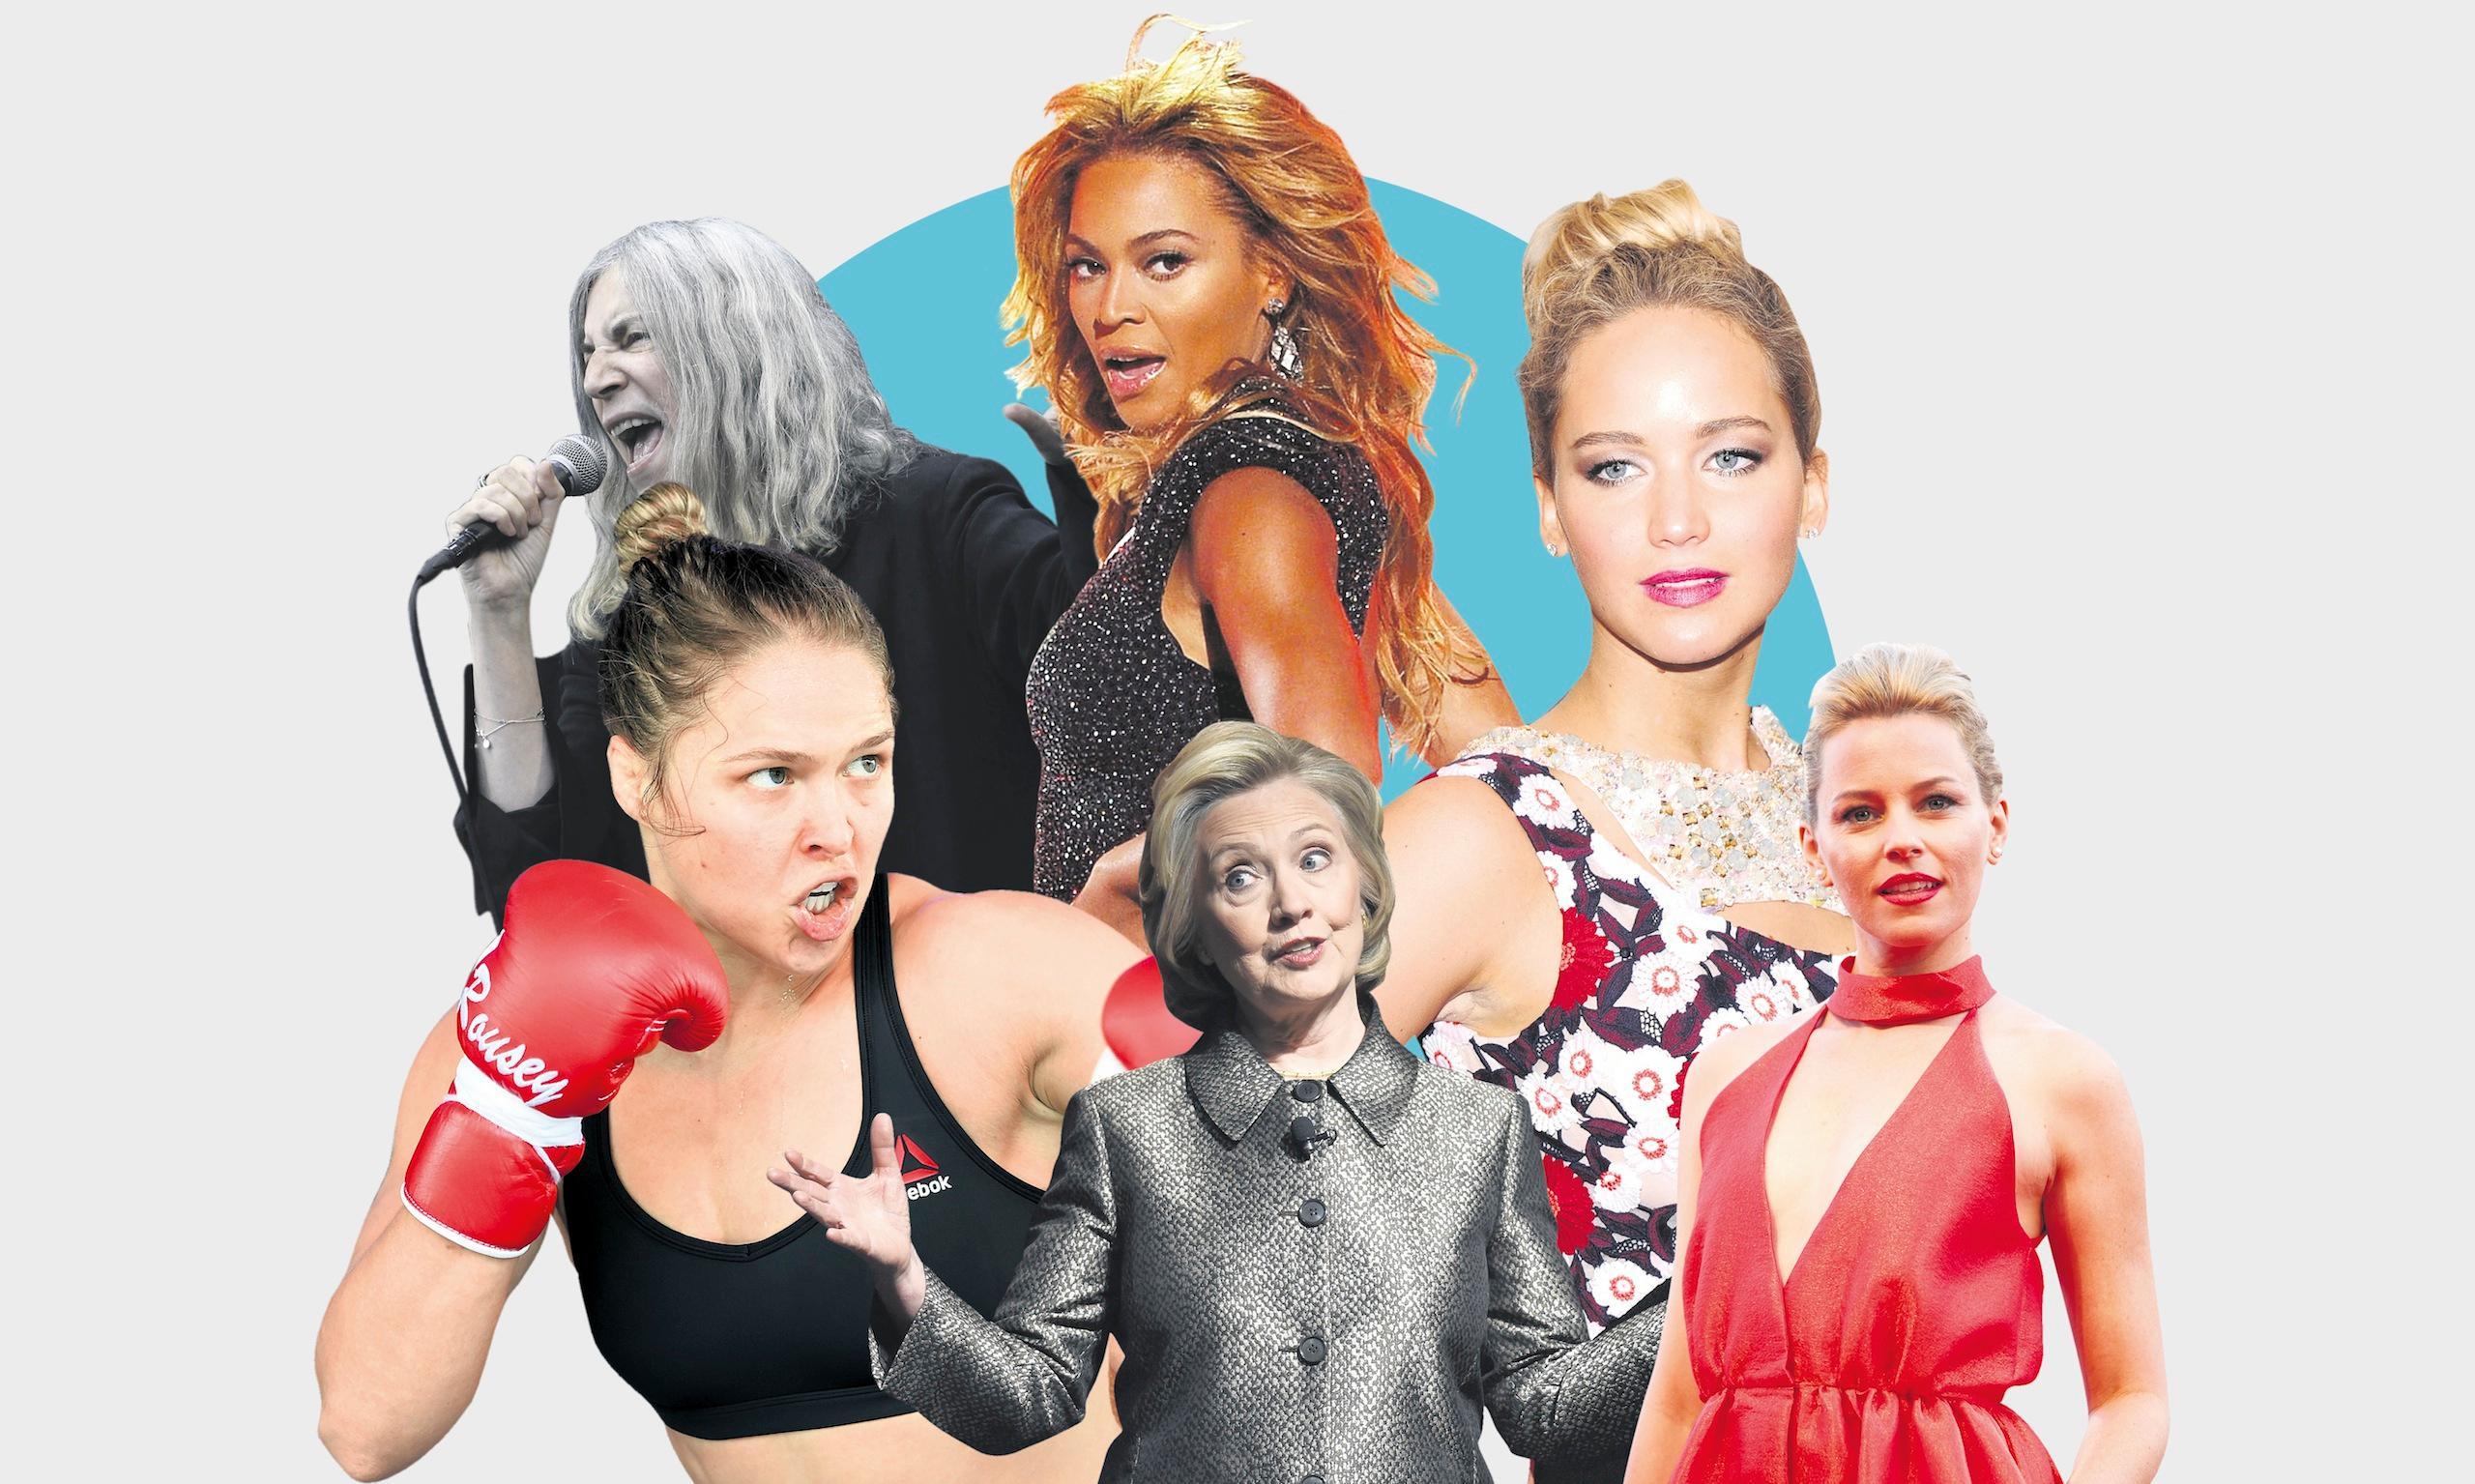 Women's Articles - Magazine cover